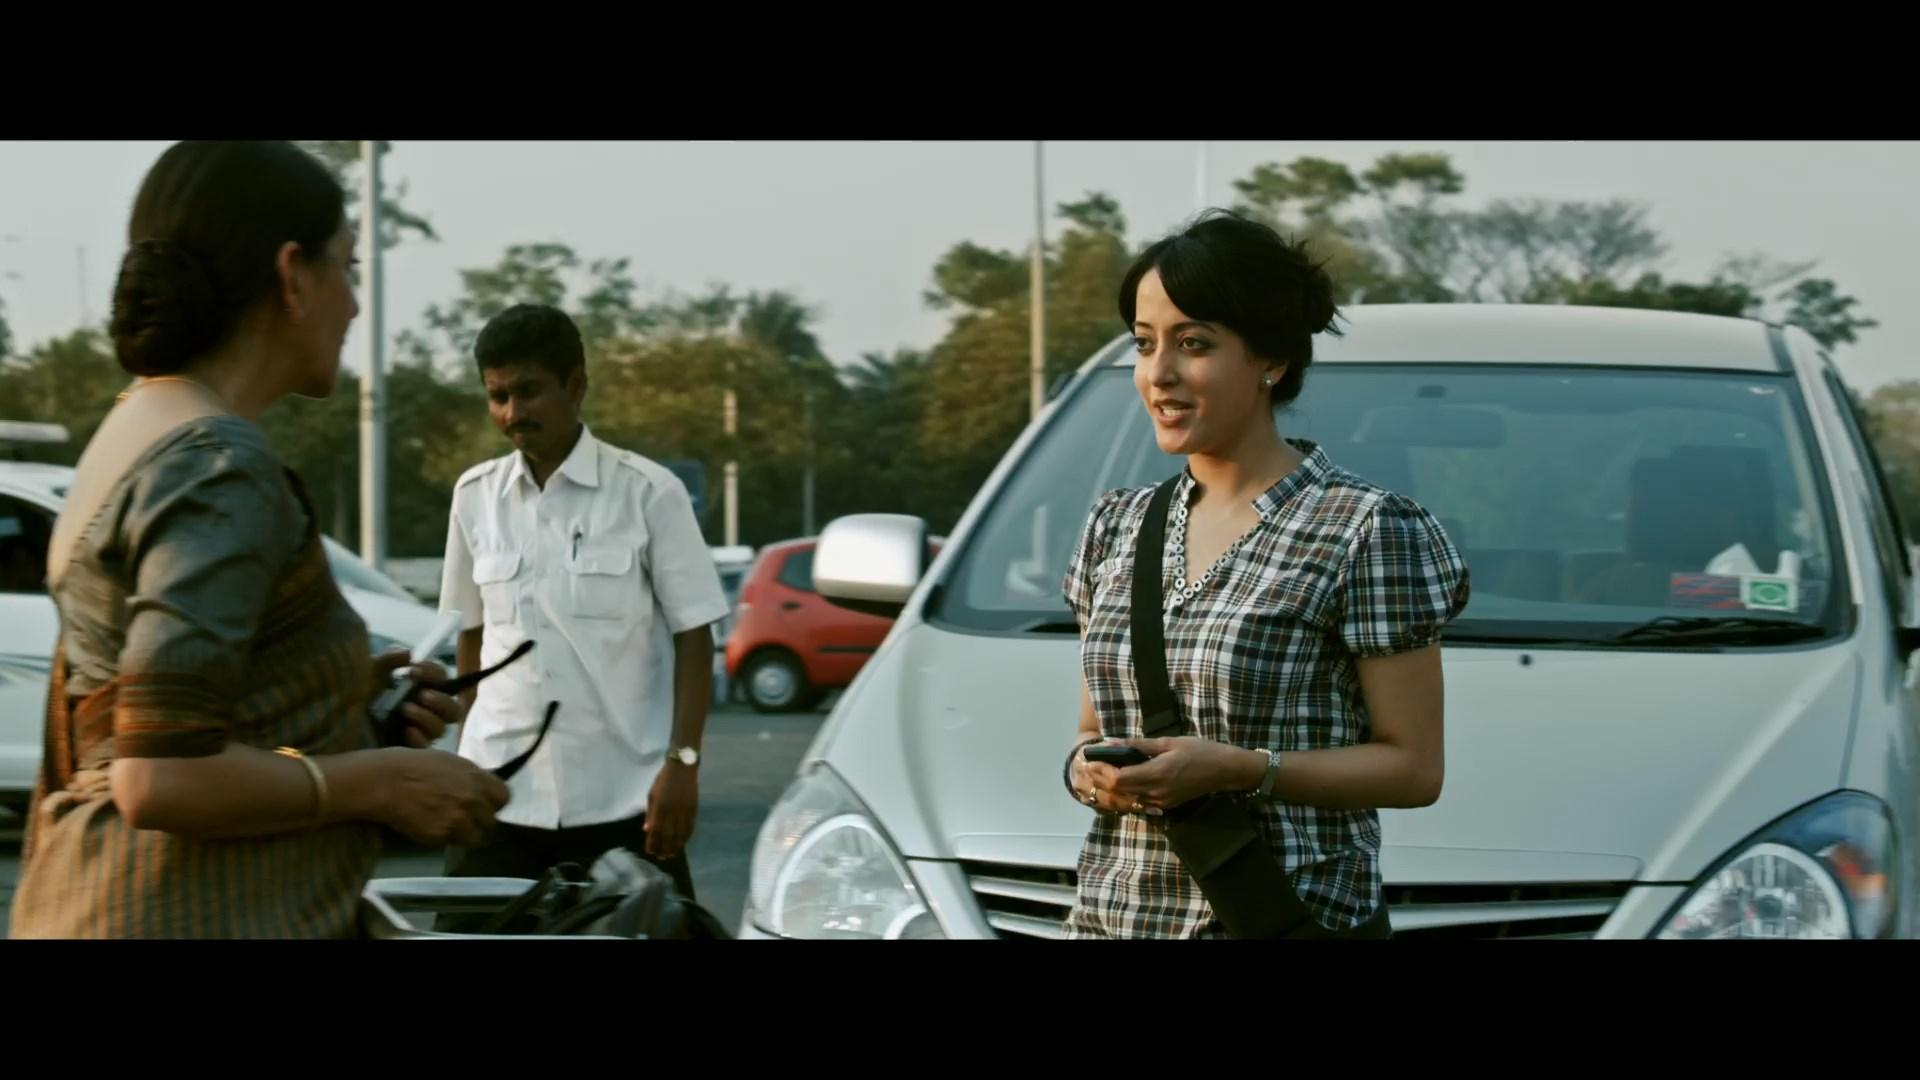 Memories in March (2020) Bengali 1080p WEB DL H264 AAC EvAn.mkv snapshot 00.05.11 [2020.06.05 06.10.